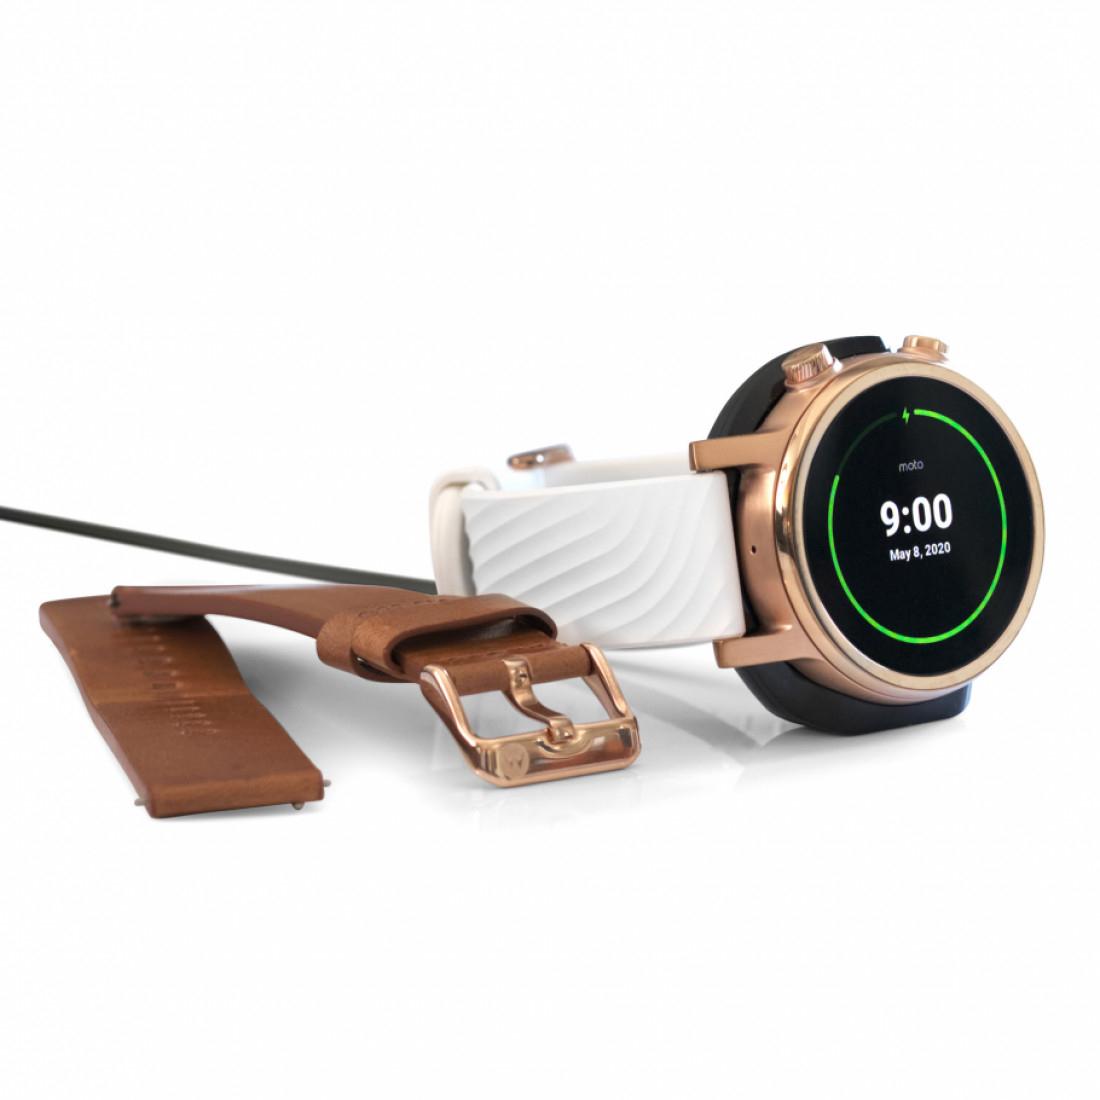 Moto 360 3rd Gen Smart Watch (Wear OS) - (Black & Silver Colour) - direct - £179.99 Direct @ Moto360